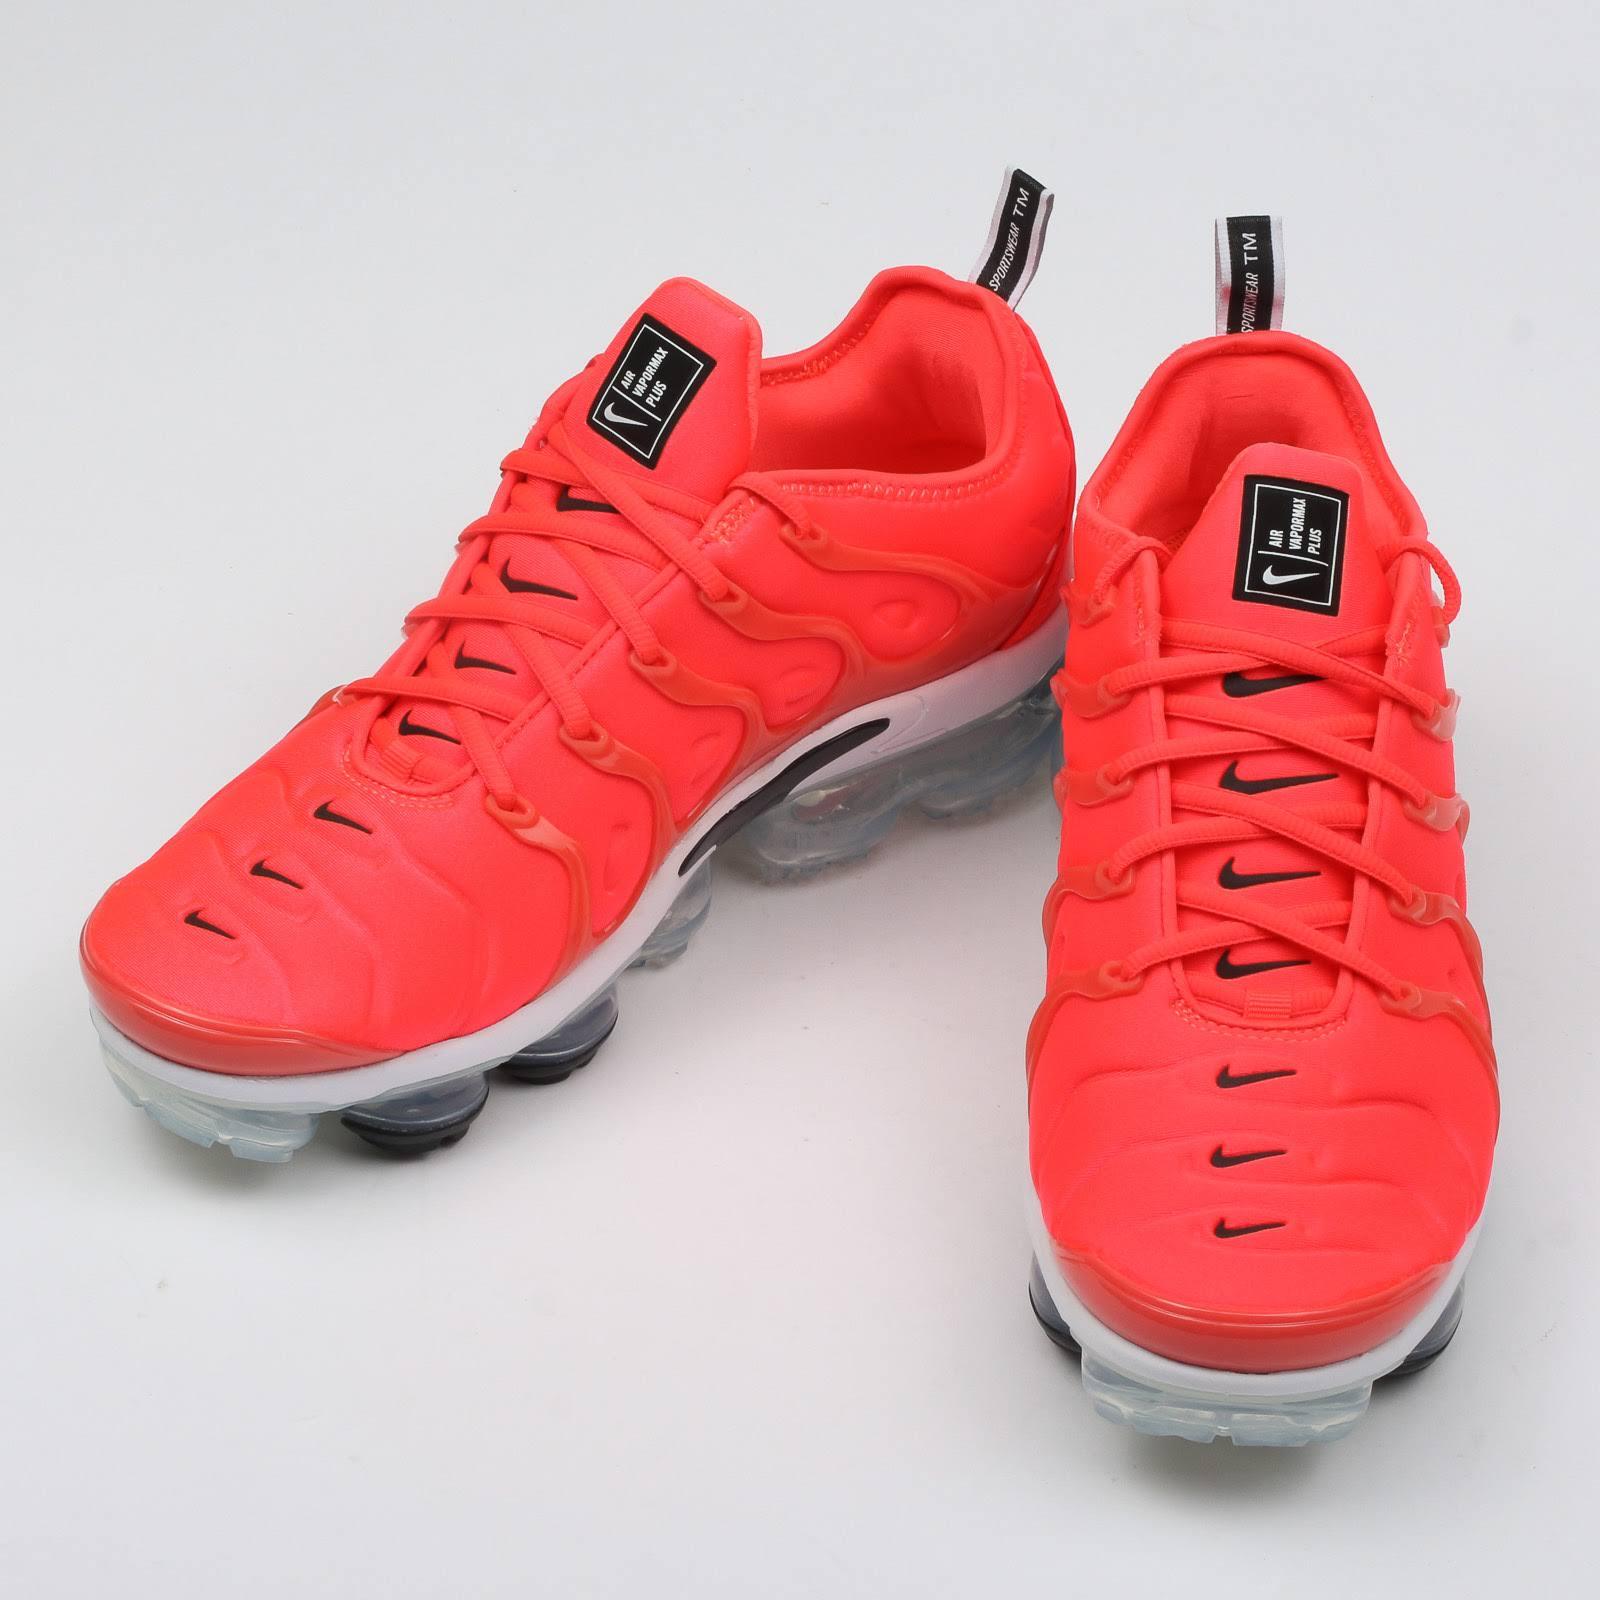 602 Orange Orange Vapormax Nike 924453 In Sneaker – YOxCYwq0A